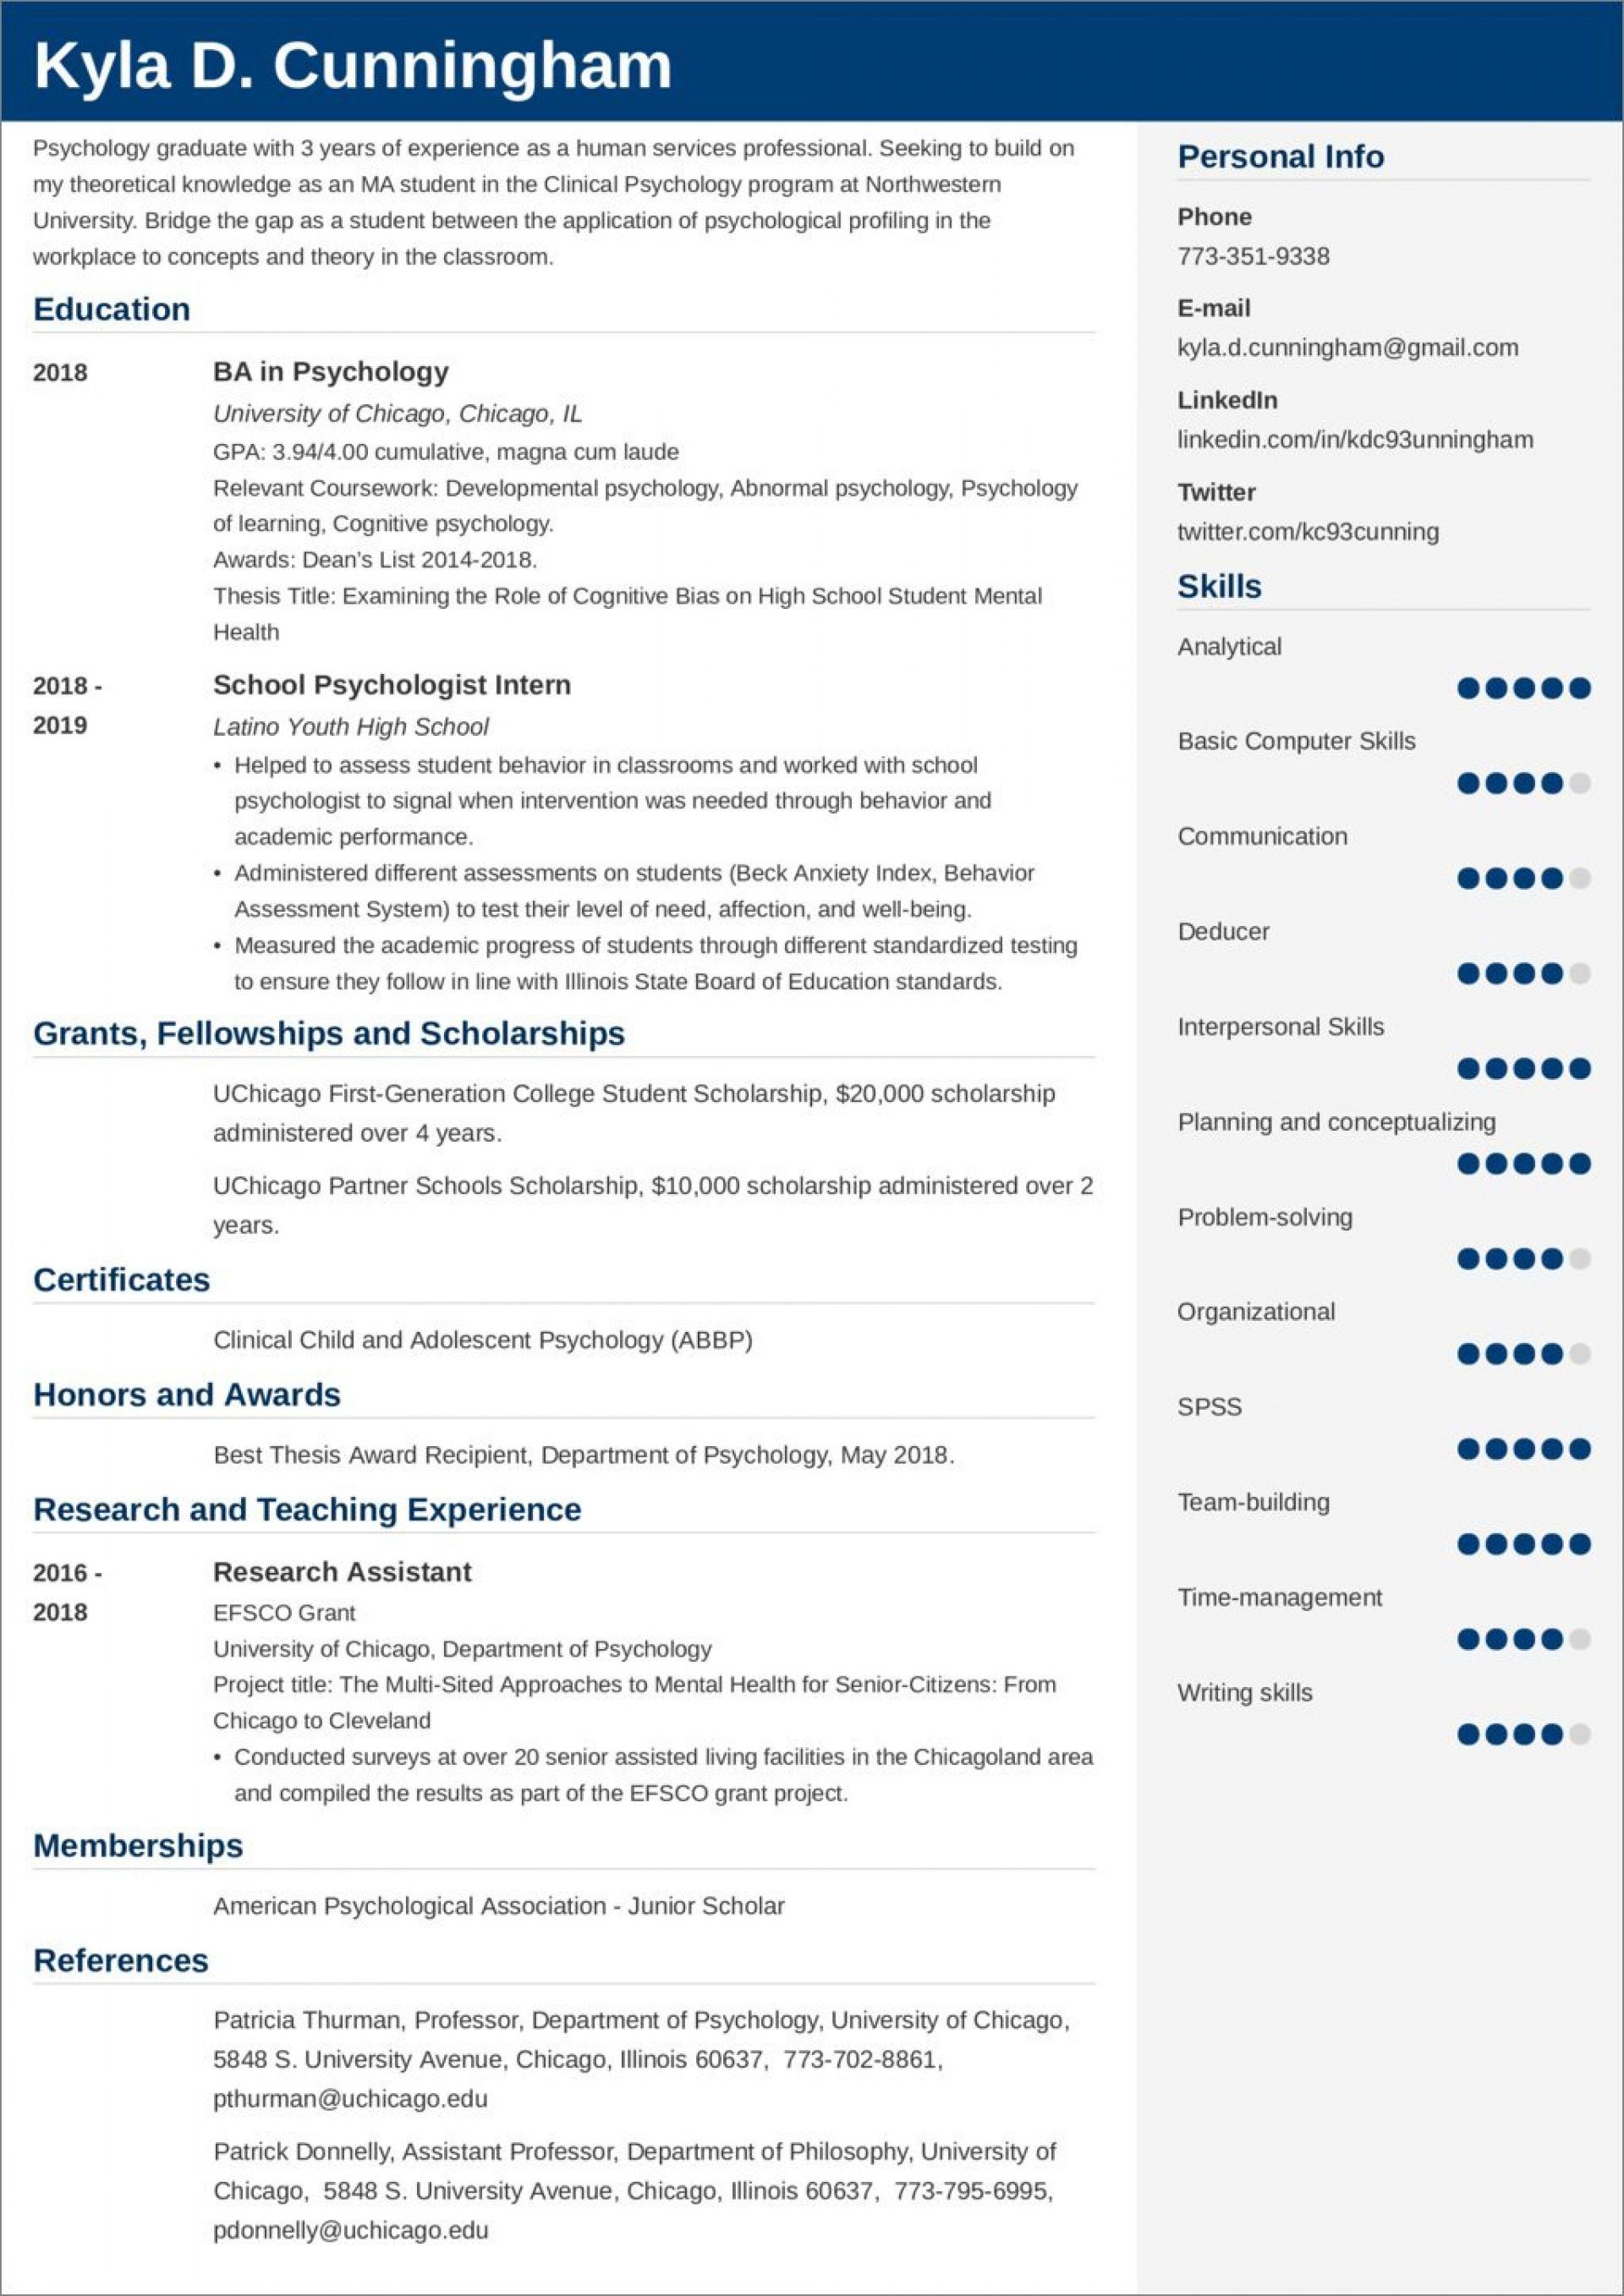 007 Wonderful Graduate School Resume Template Idea  Word Free1920